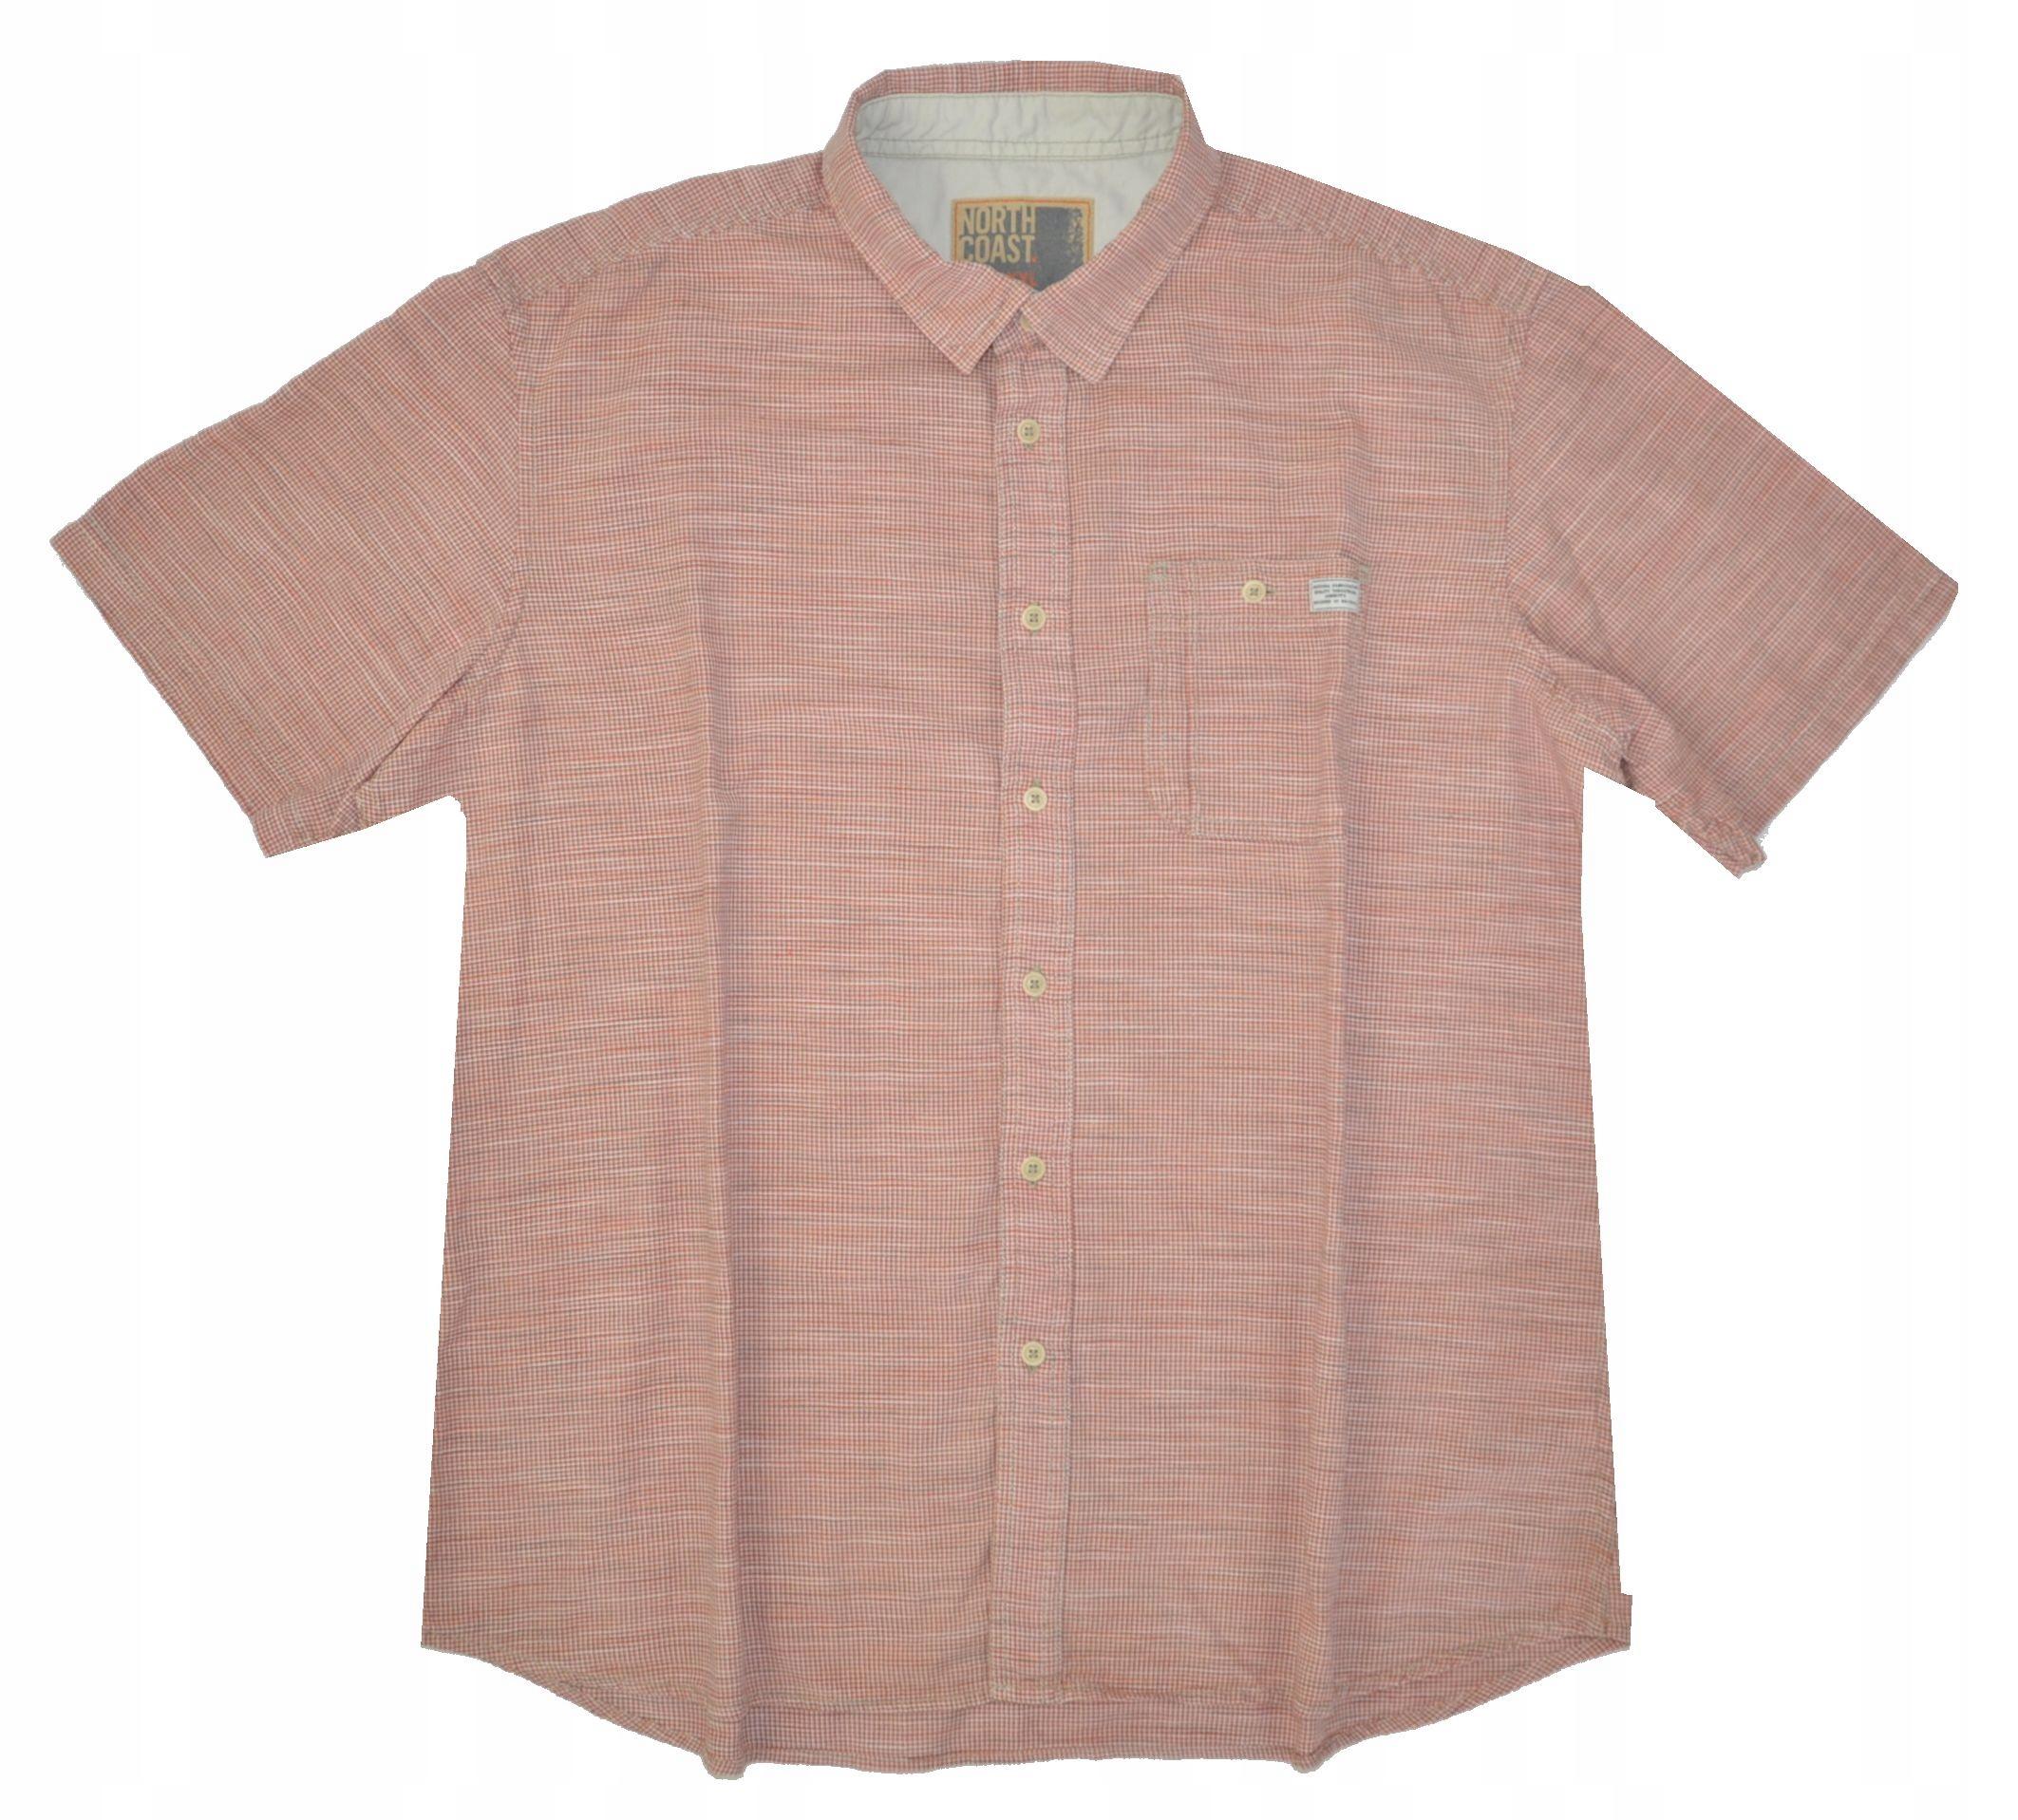 NORTH COAST M&S koszula lato koralowa XXL 47